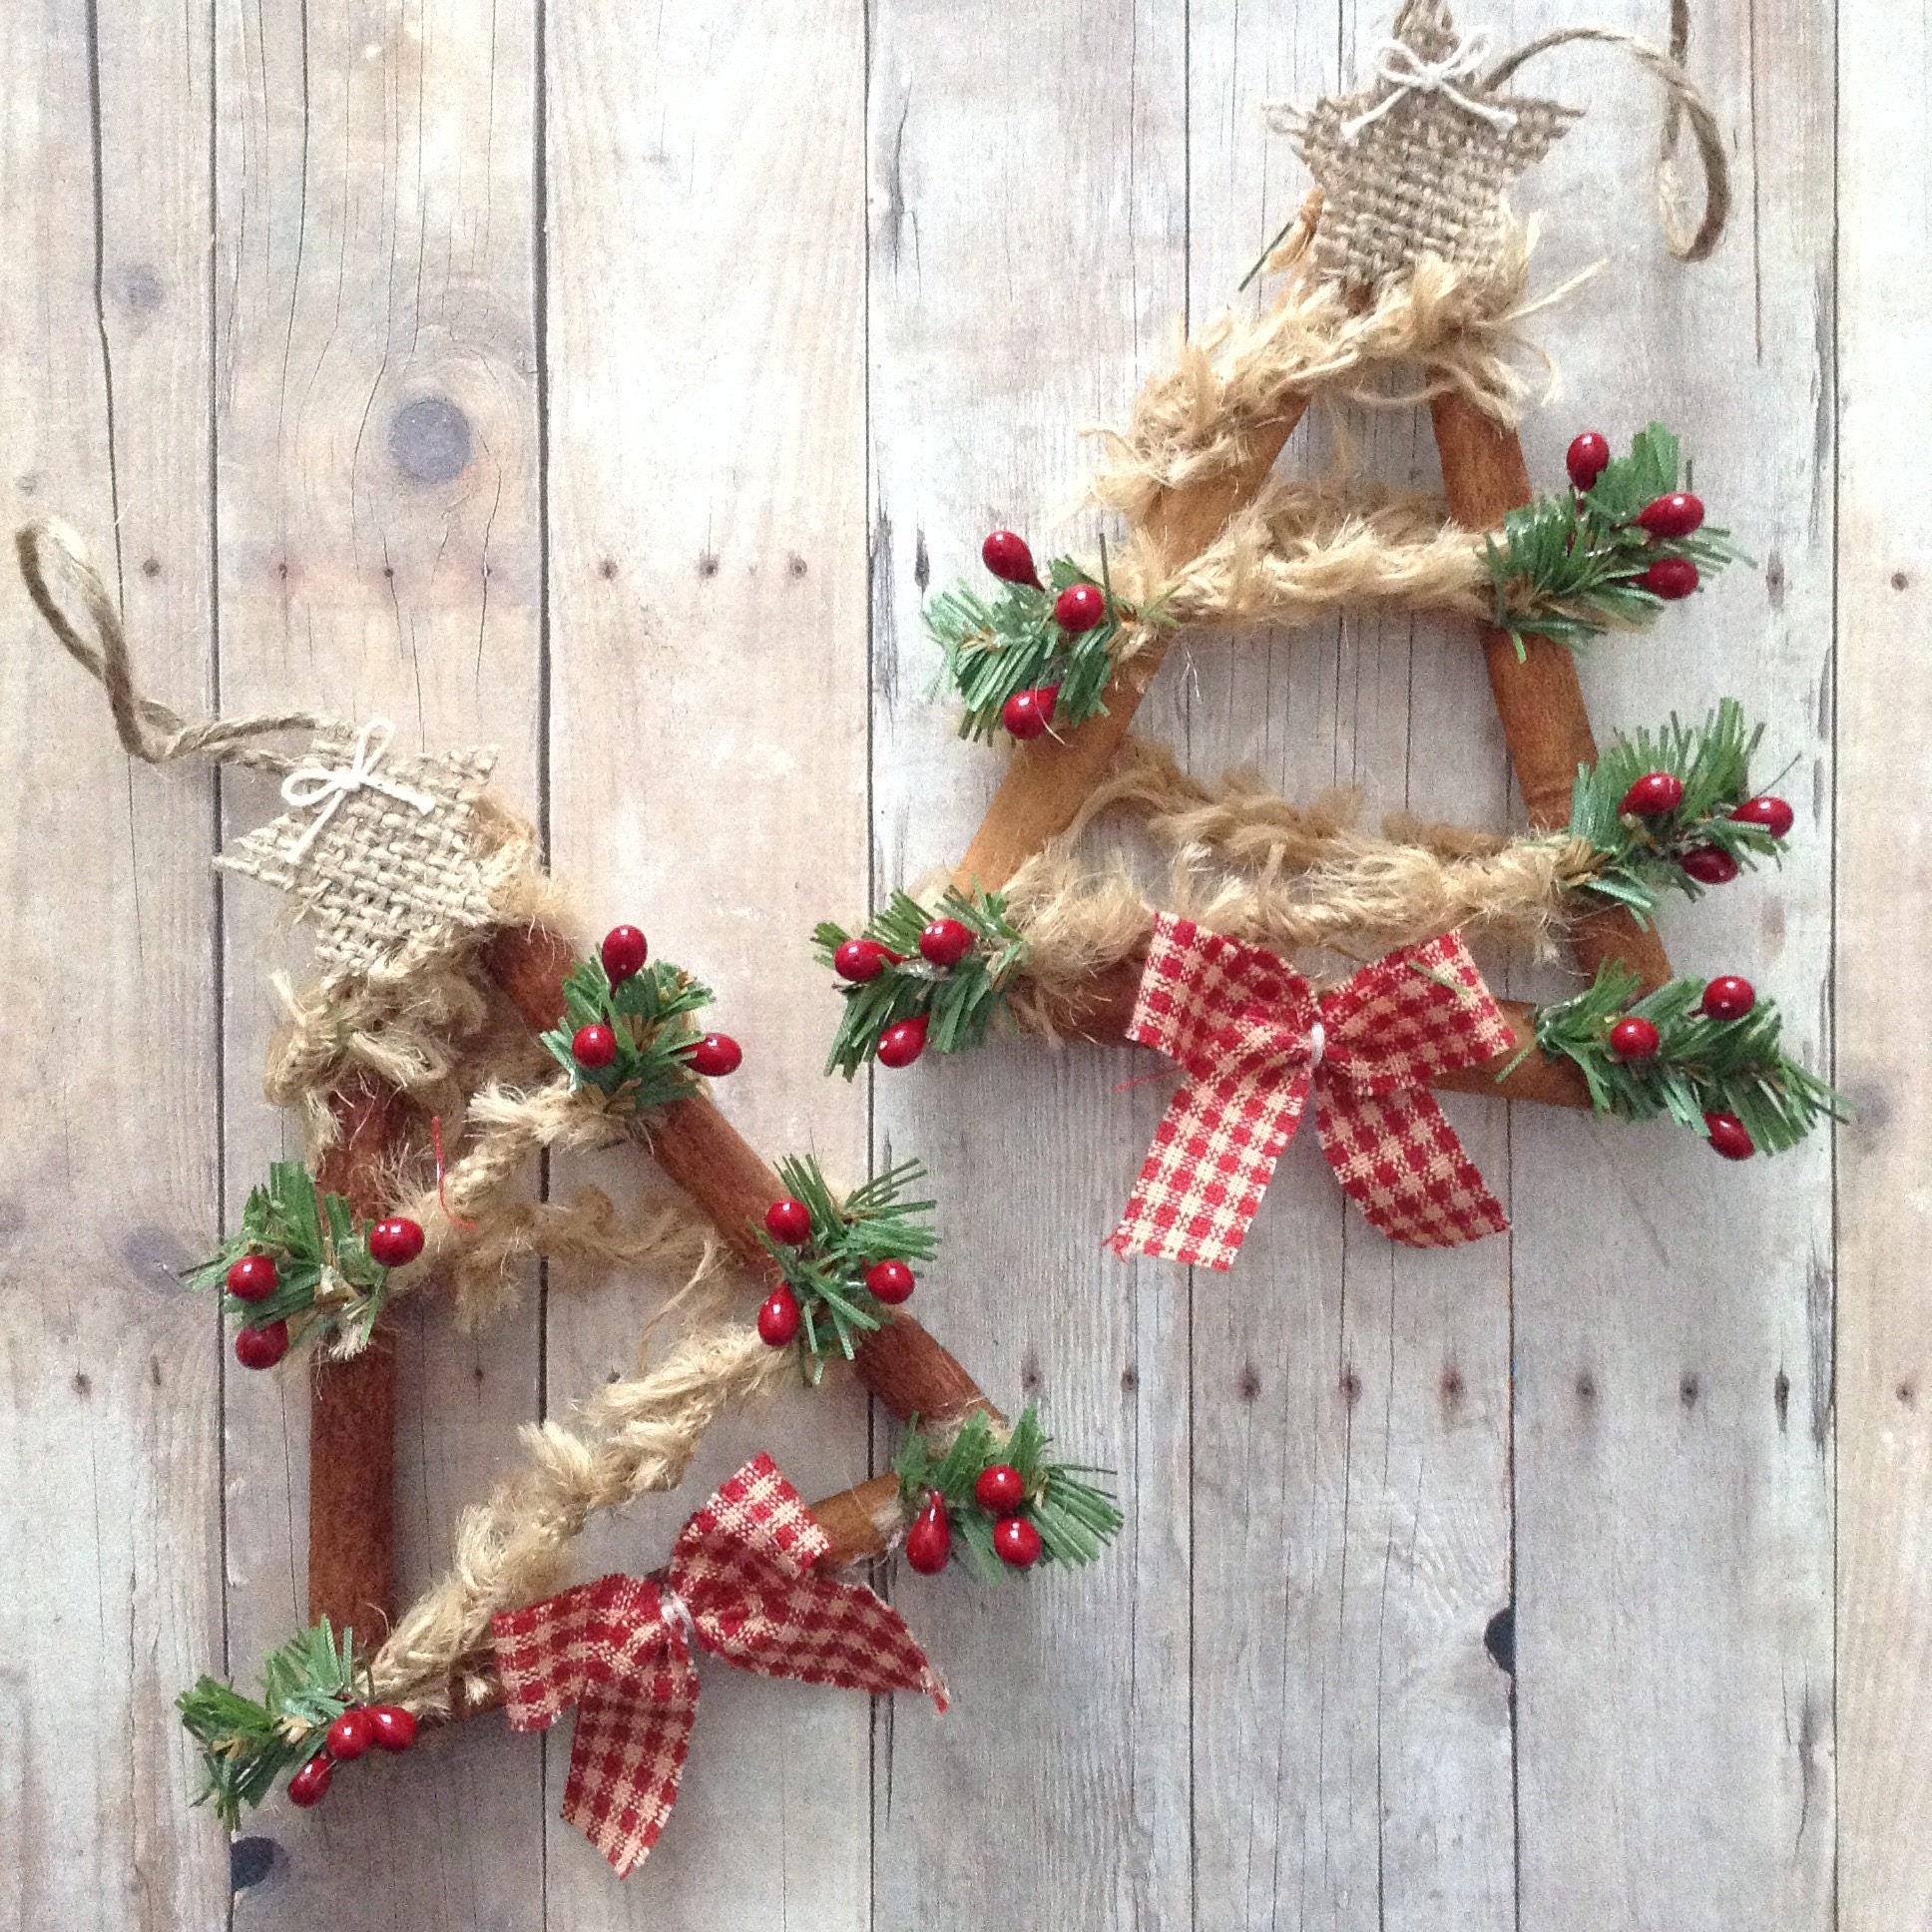 Christmas Tree Ornaments / Cinnamon Sticks Christmas Tree